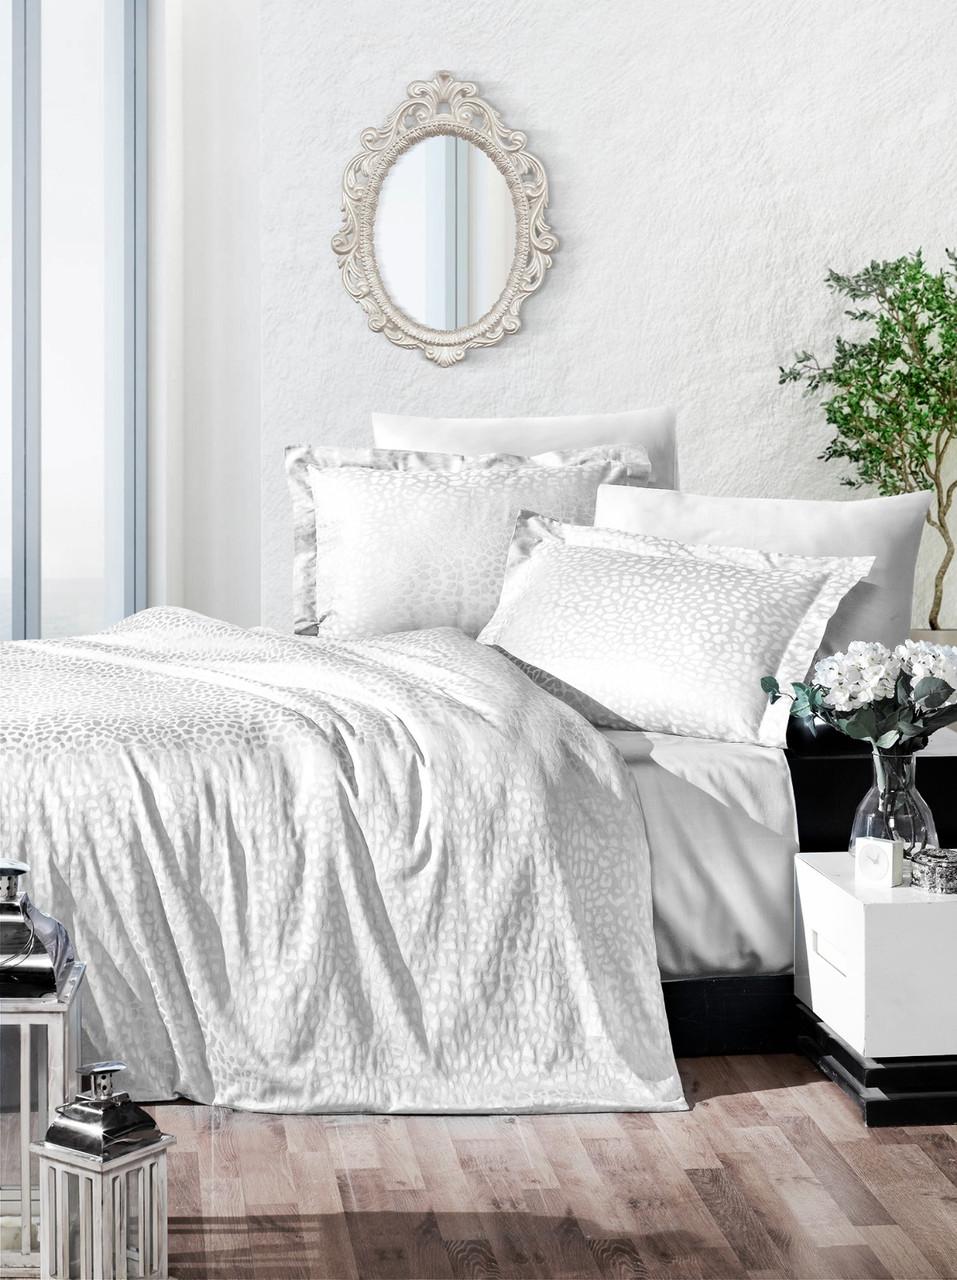 Комплект постельного белья Ecosse VIP сатин жаккард 200х220 Damask Beyaz